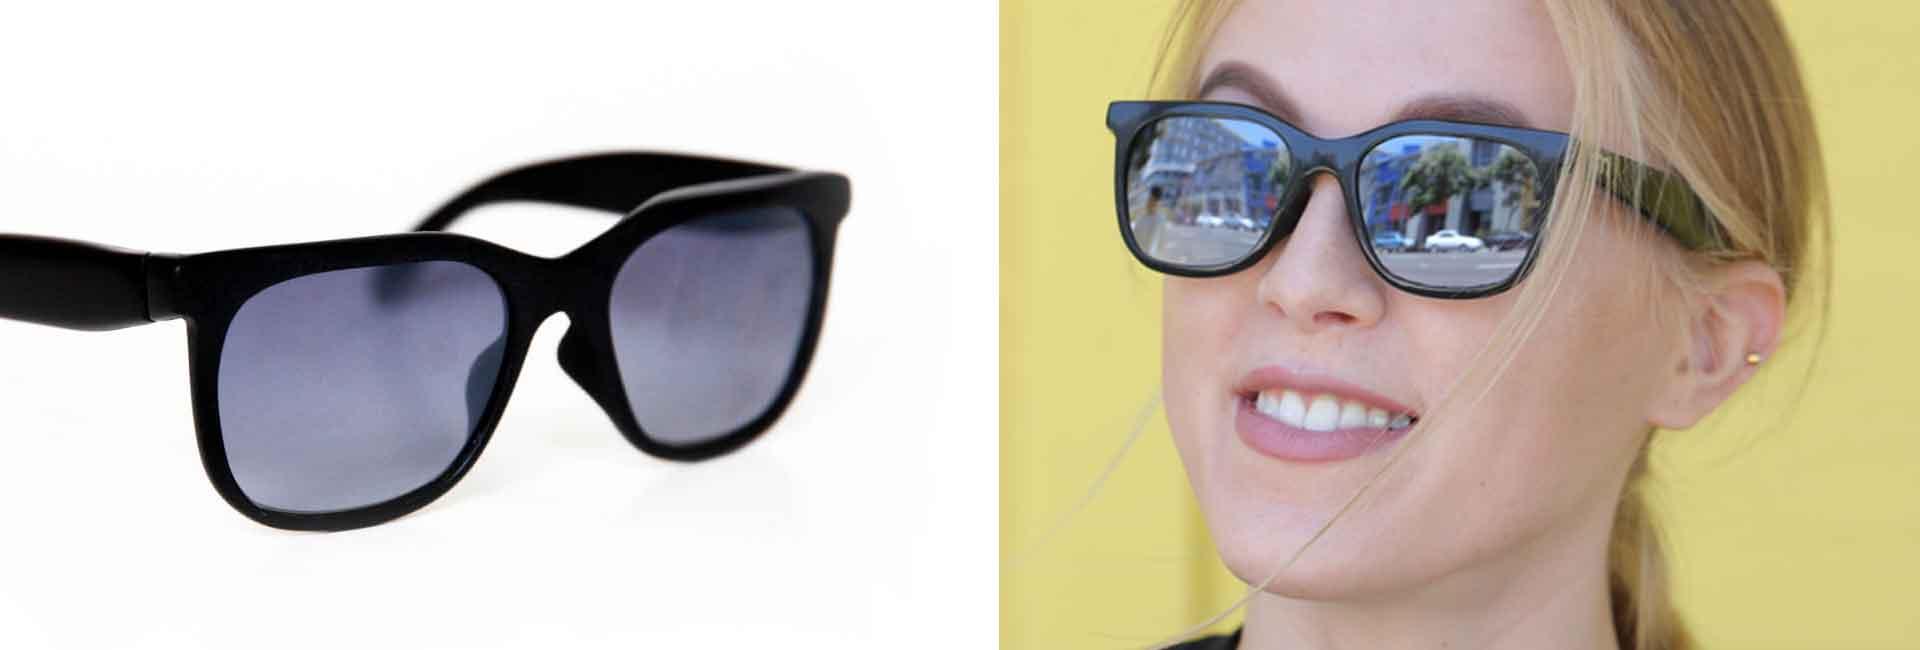 norm-glasses